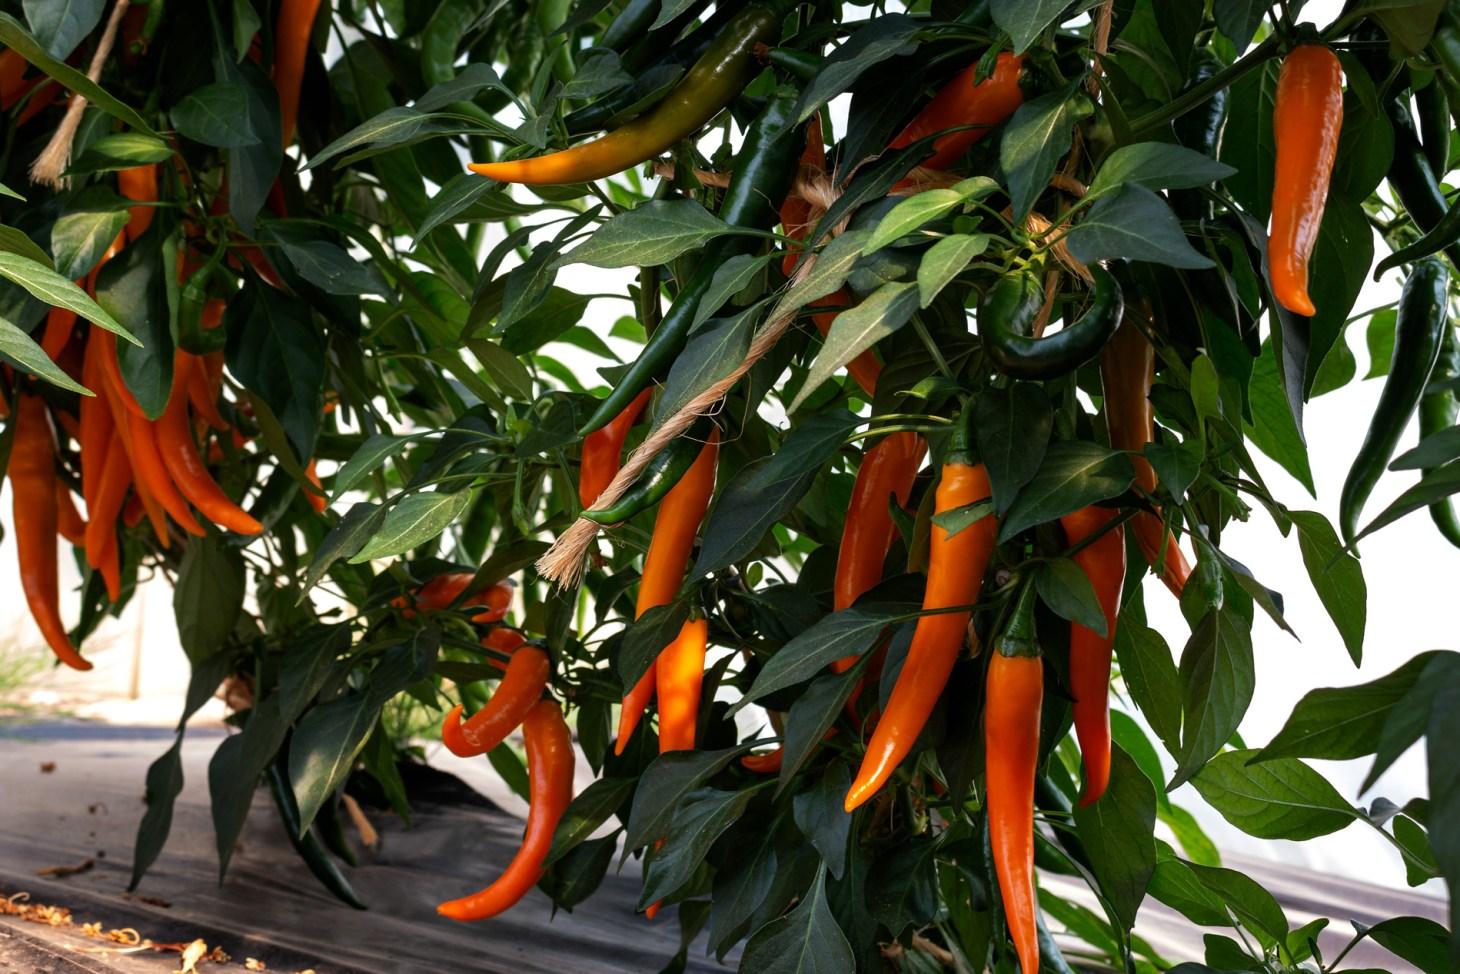 gelbe Pepperoni am Busch